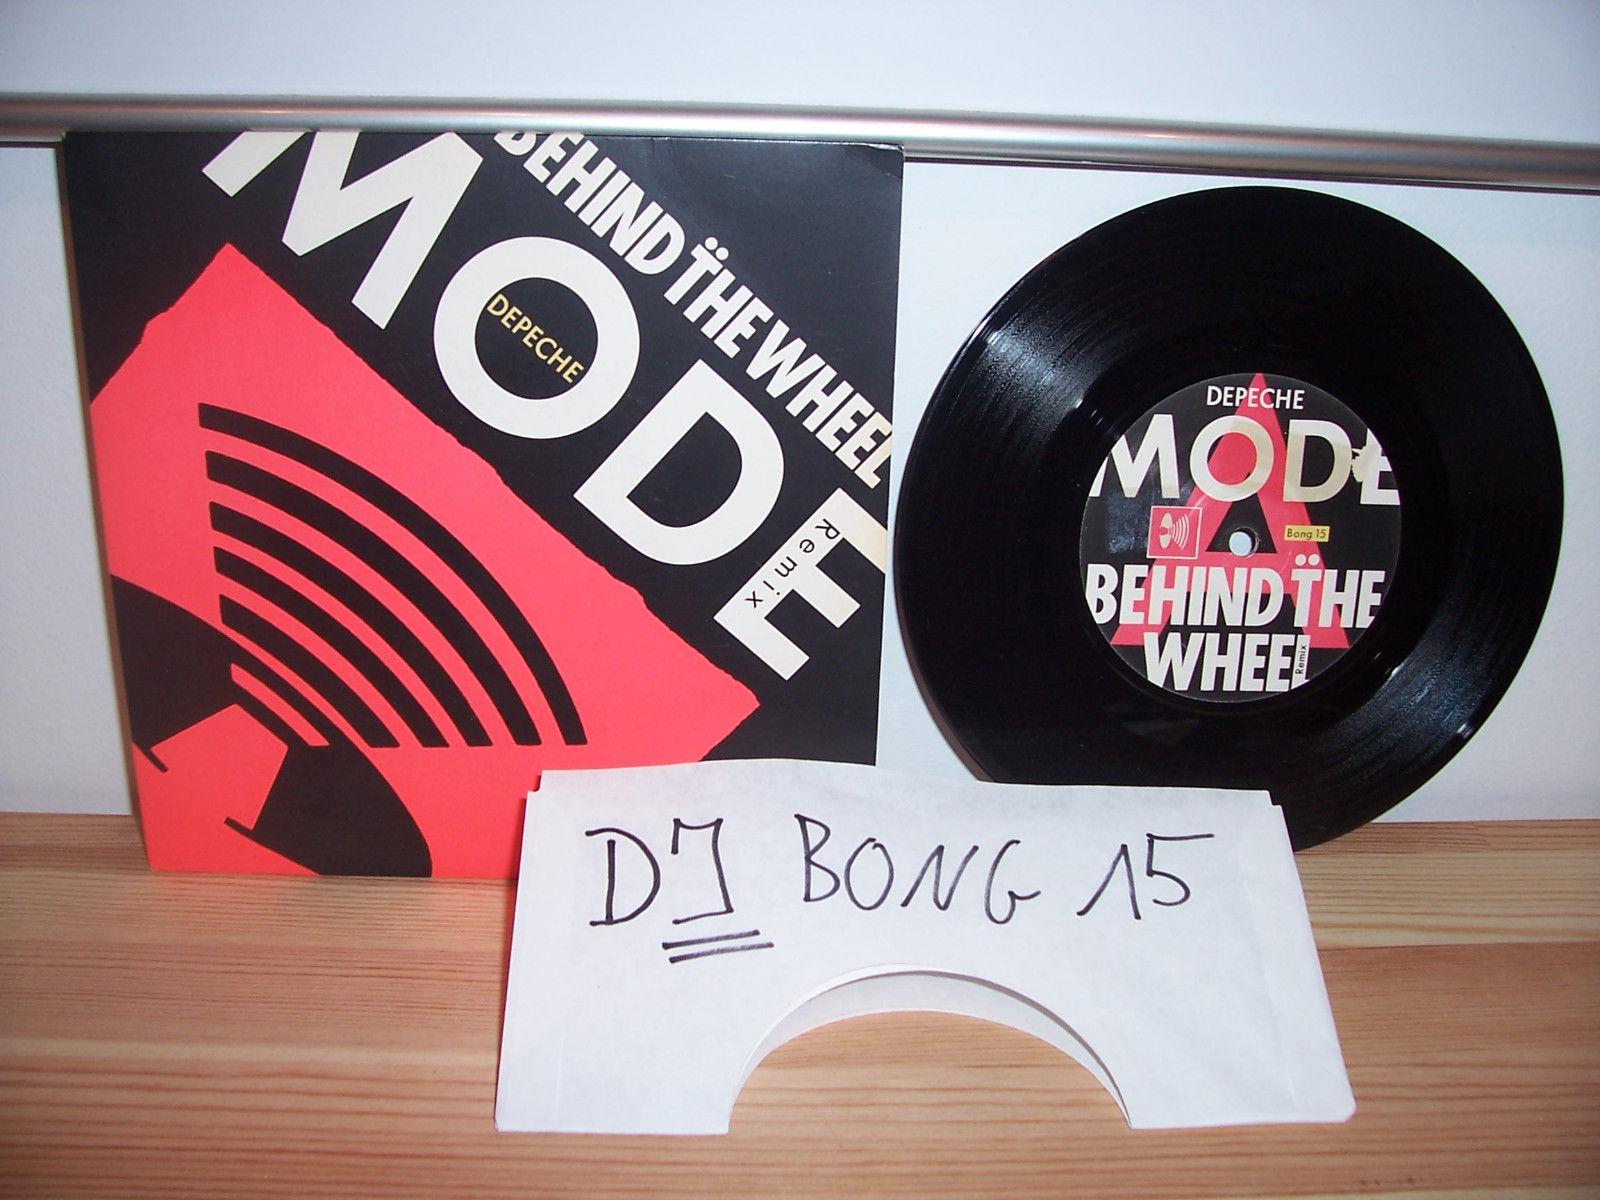 "Depeche Mode 7"" Single BEHIND THE WHEEL - DJ BONG 15 - UK PROMO"